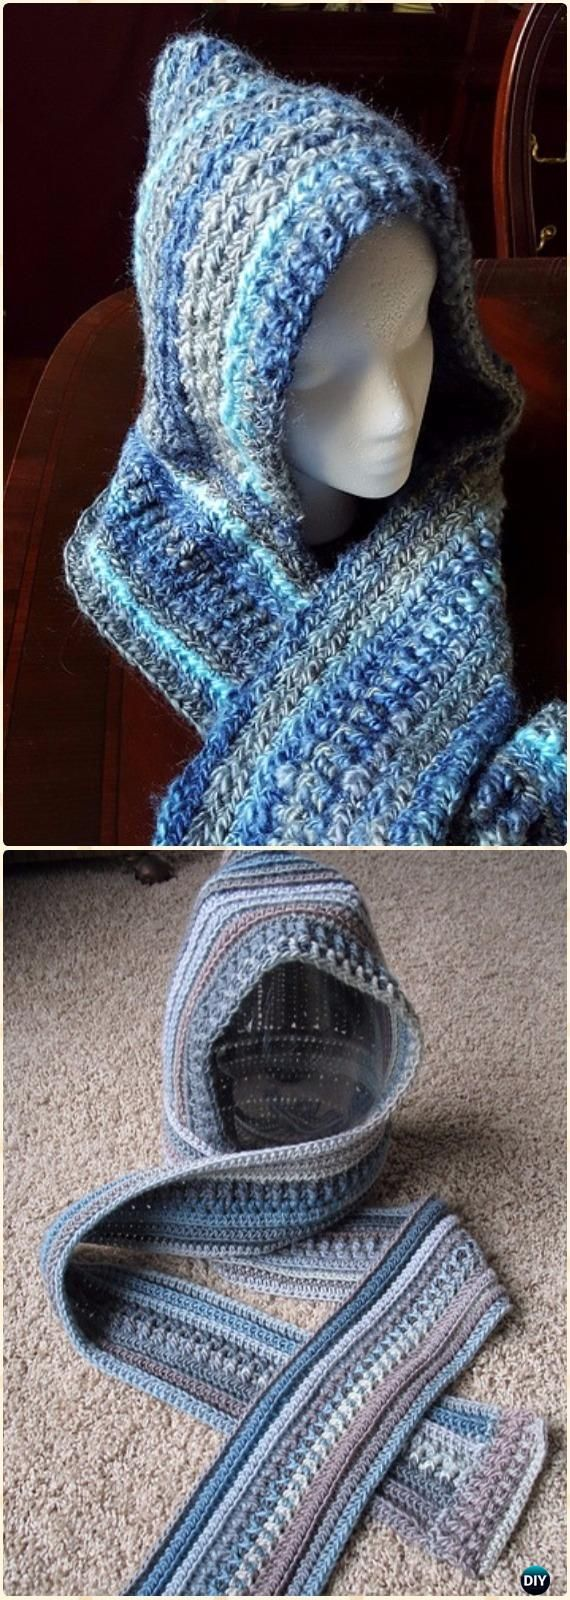 Crochet Hoodie Scarf Scoodie Free Patterns | Gorros, Tejido y Ganchillo